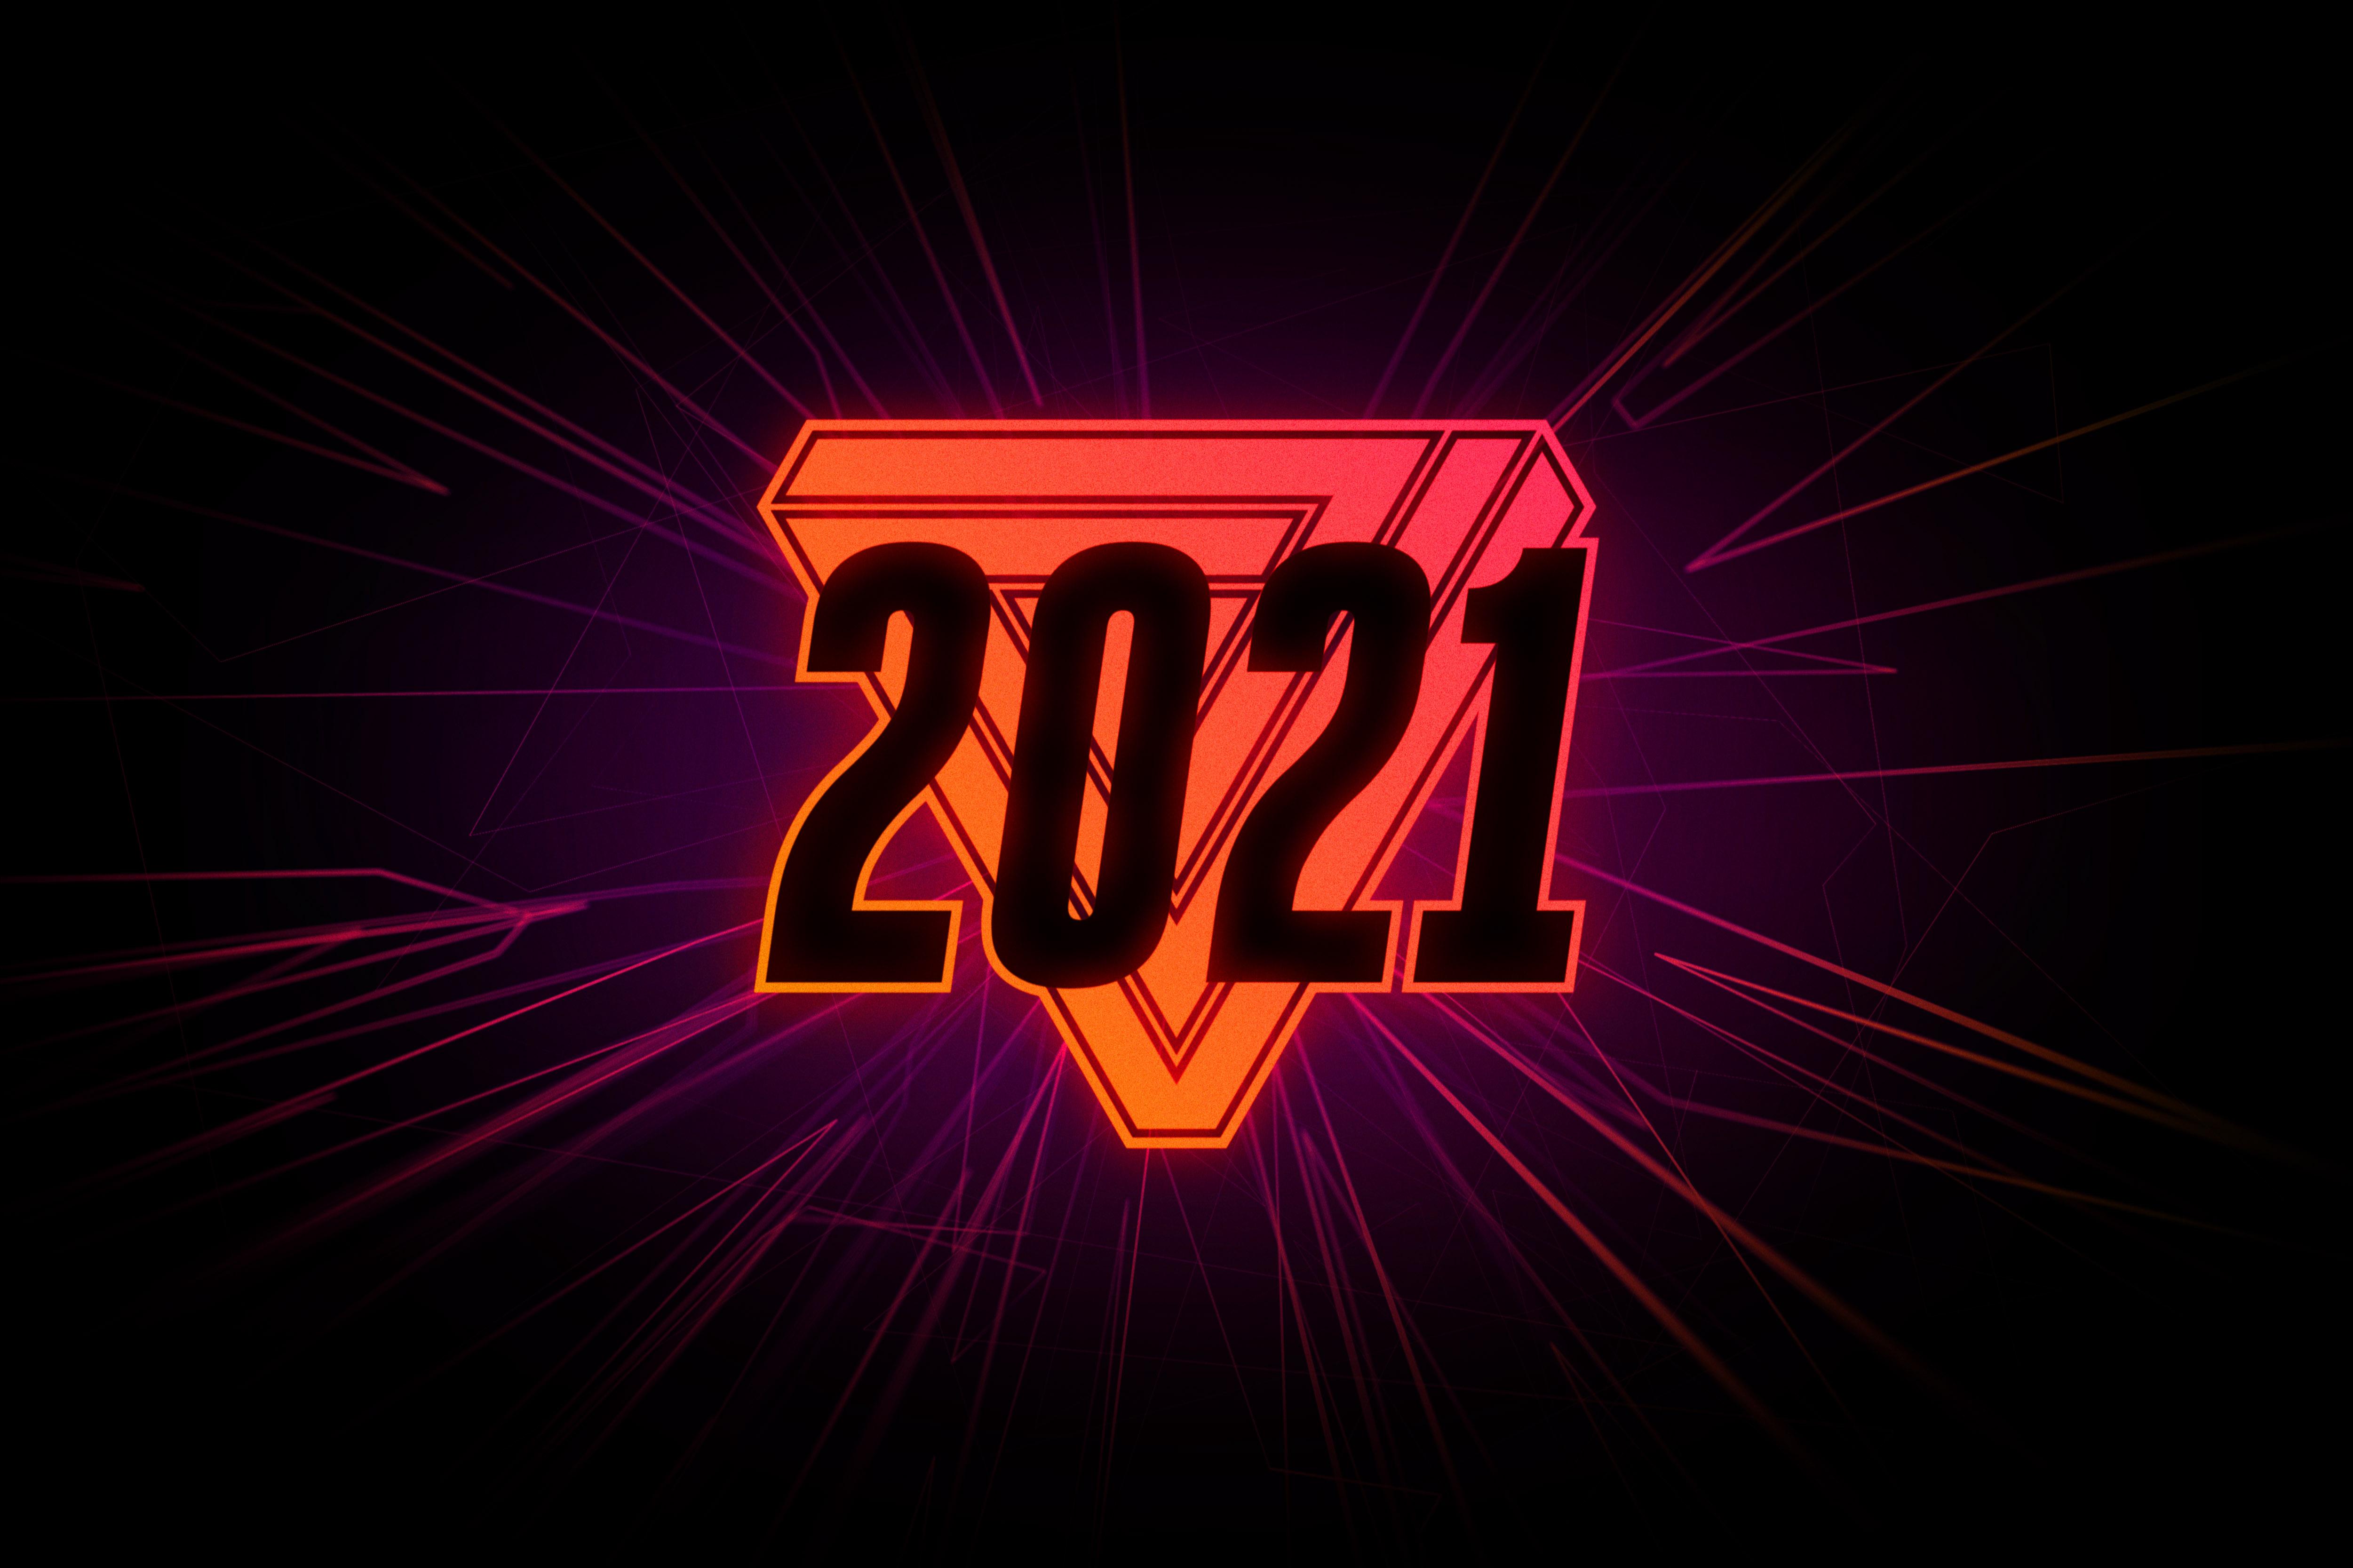 Verge 2021